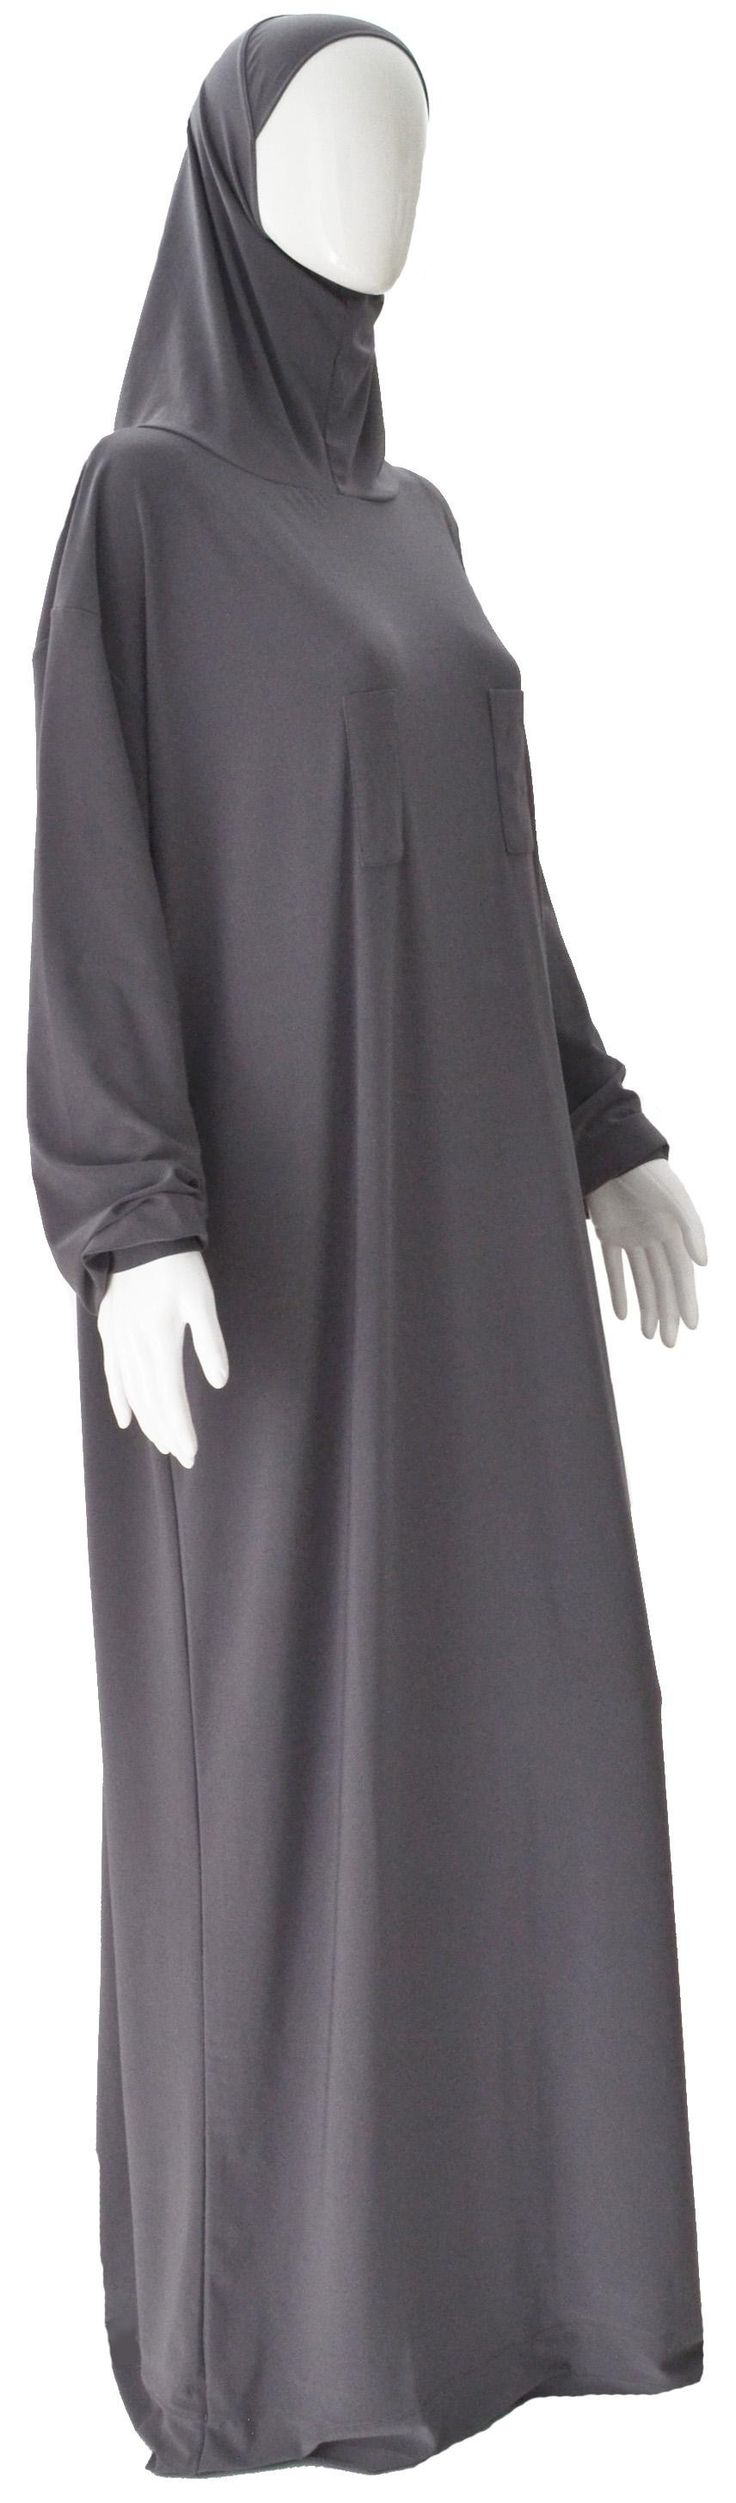 Abaya Layina : ultra pratique et confortable, à 29.9 euros seulement.